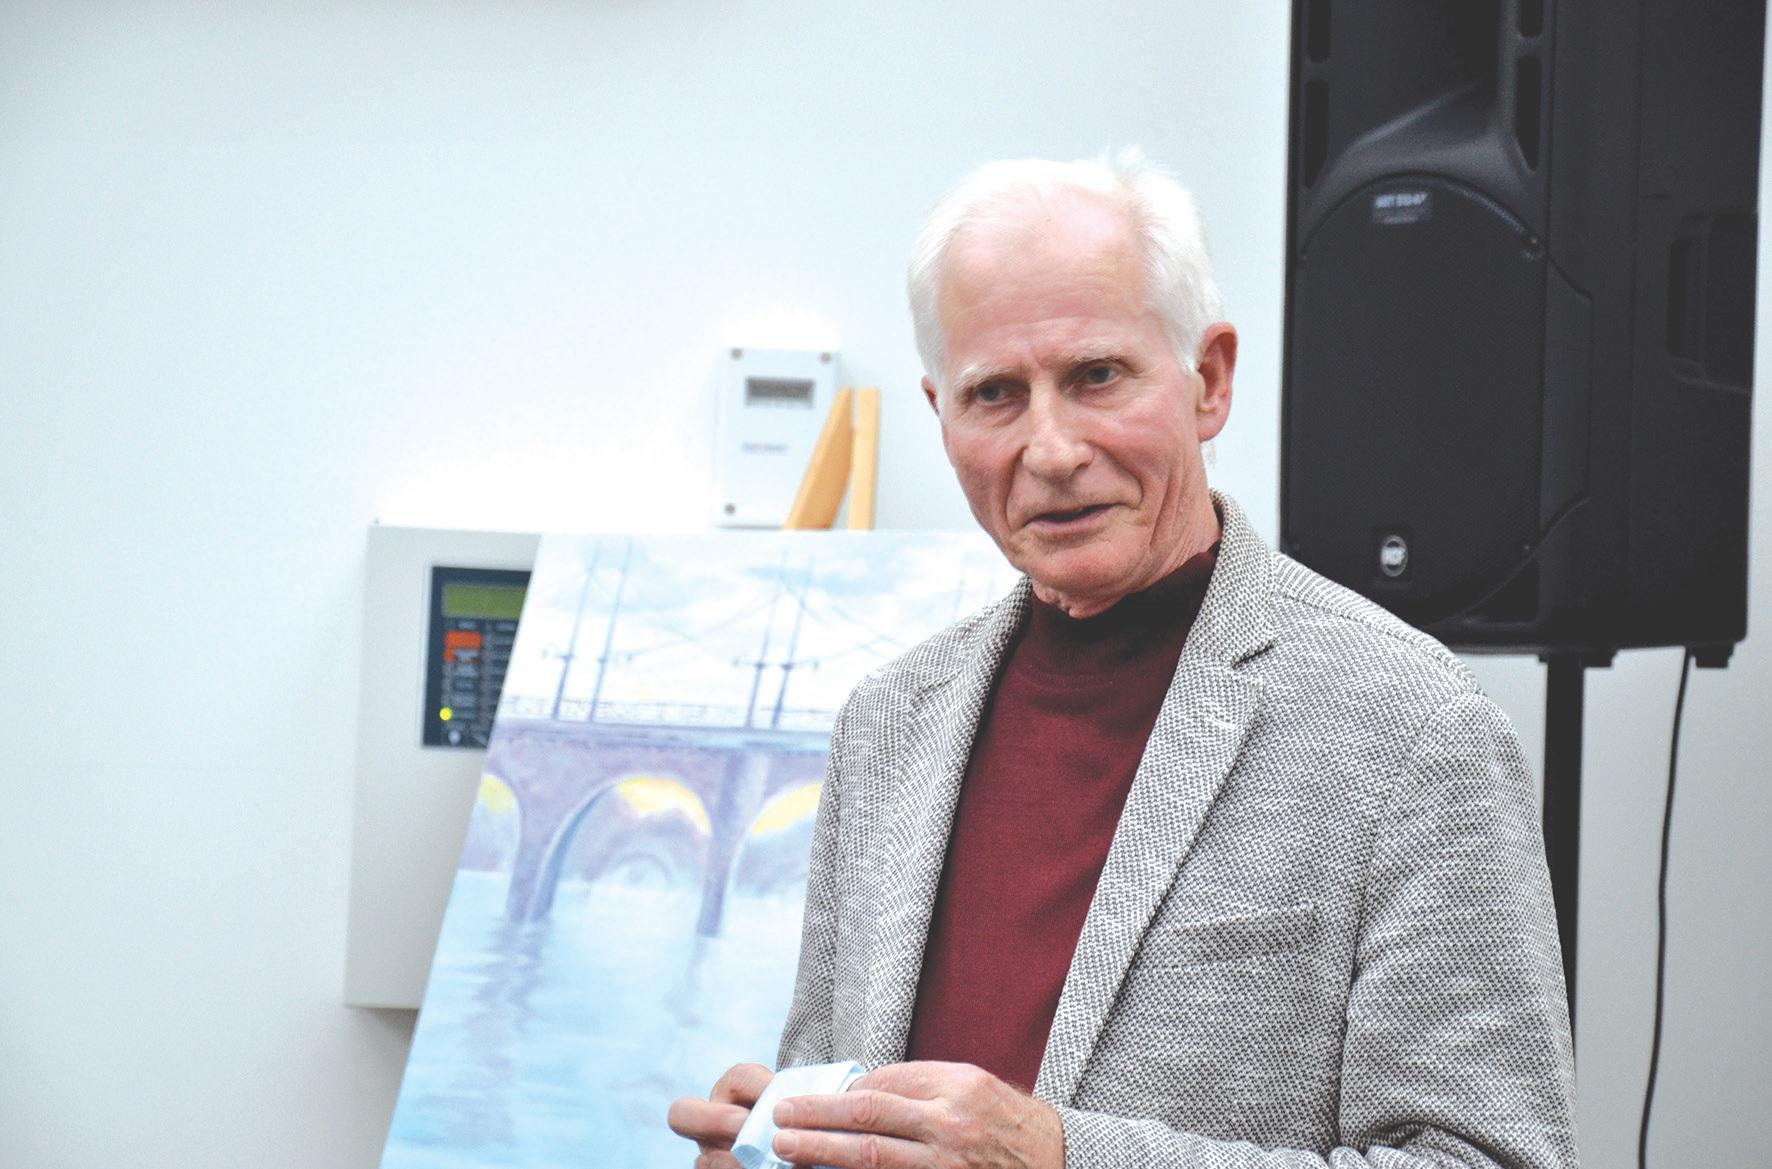 Buvęs ilgametis Muzikos mokyklos direktorius Petras Labeckis.